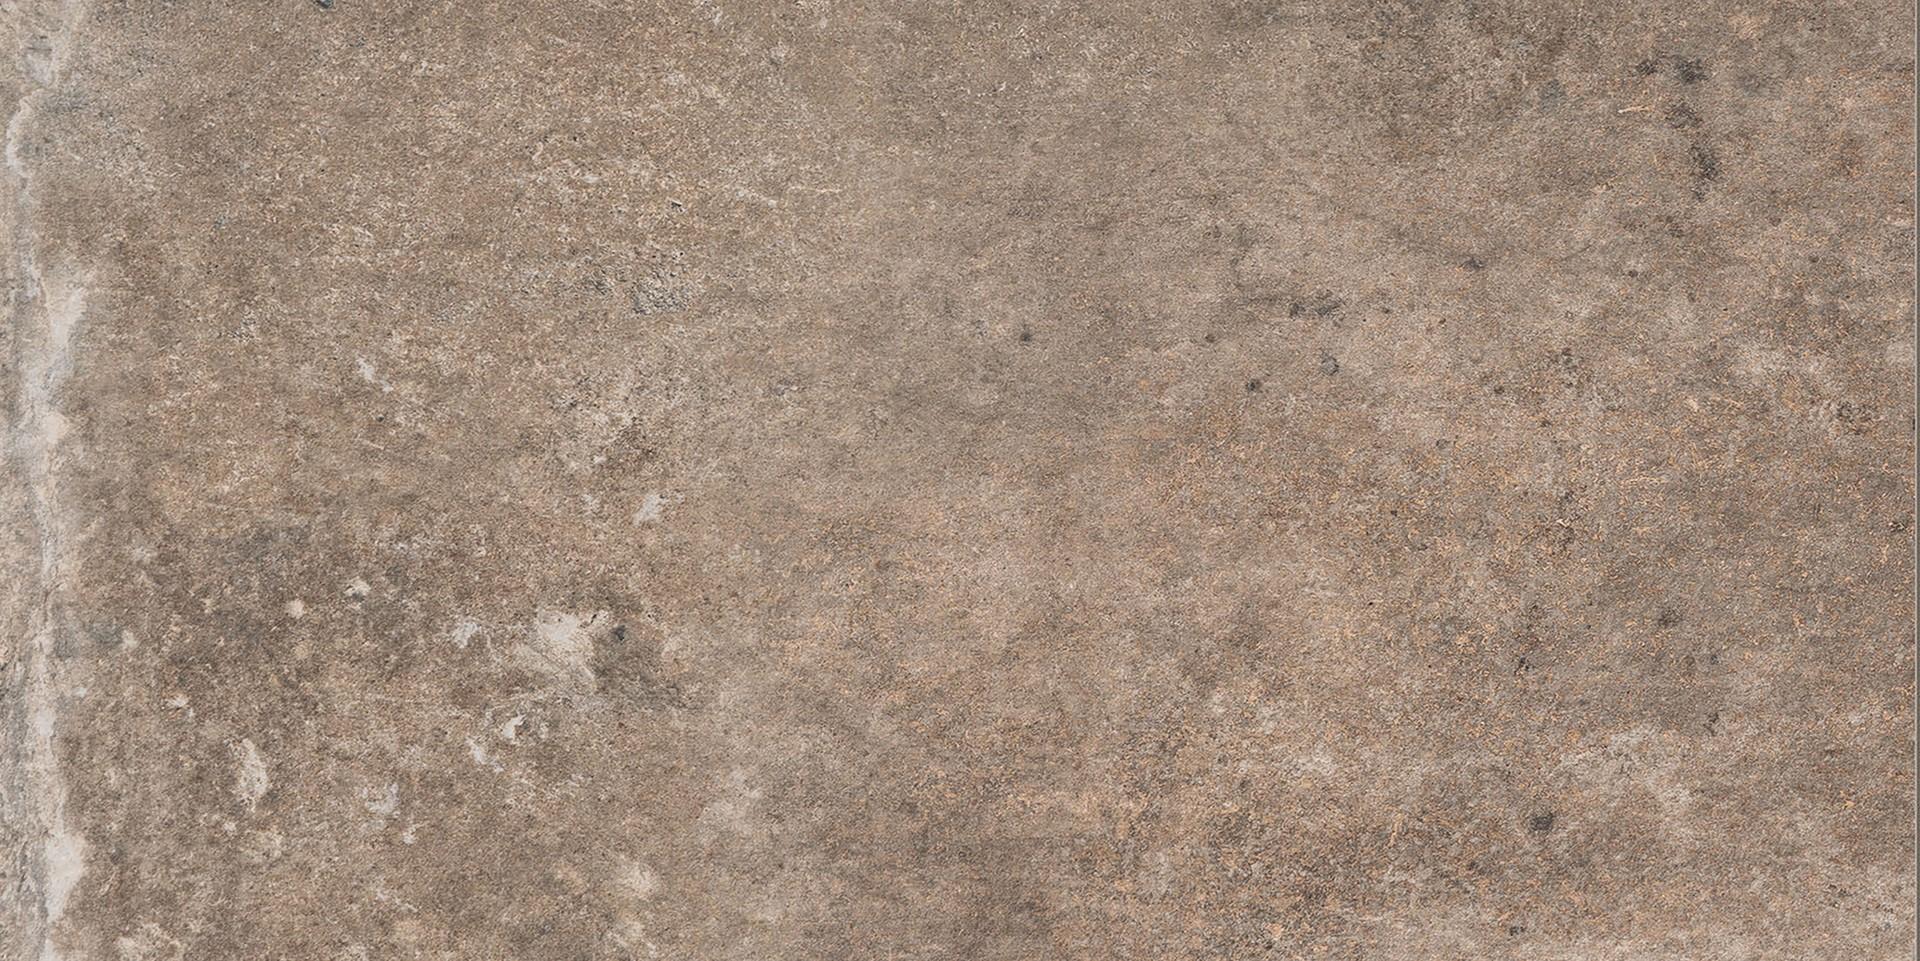 Dlažba Beige 45x90 cm, mat, rect.